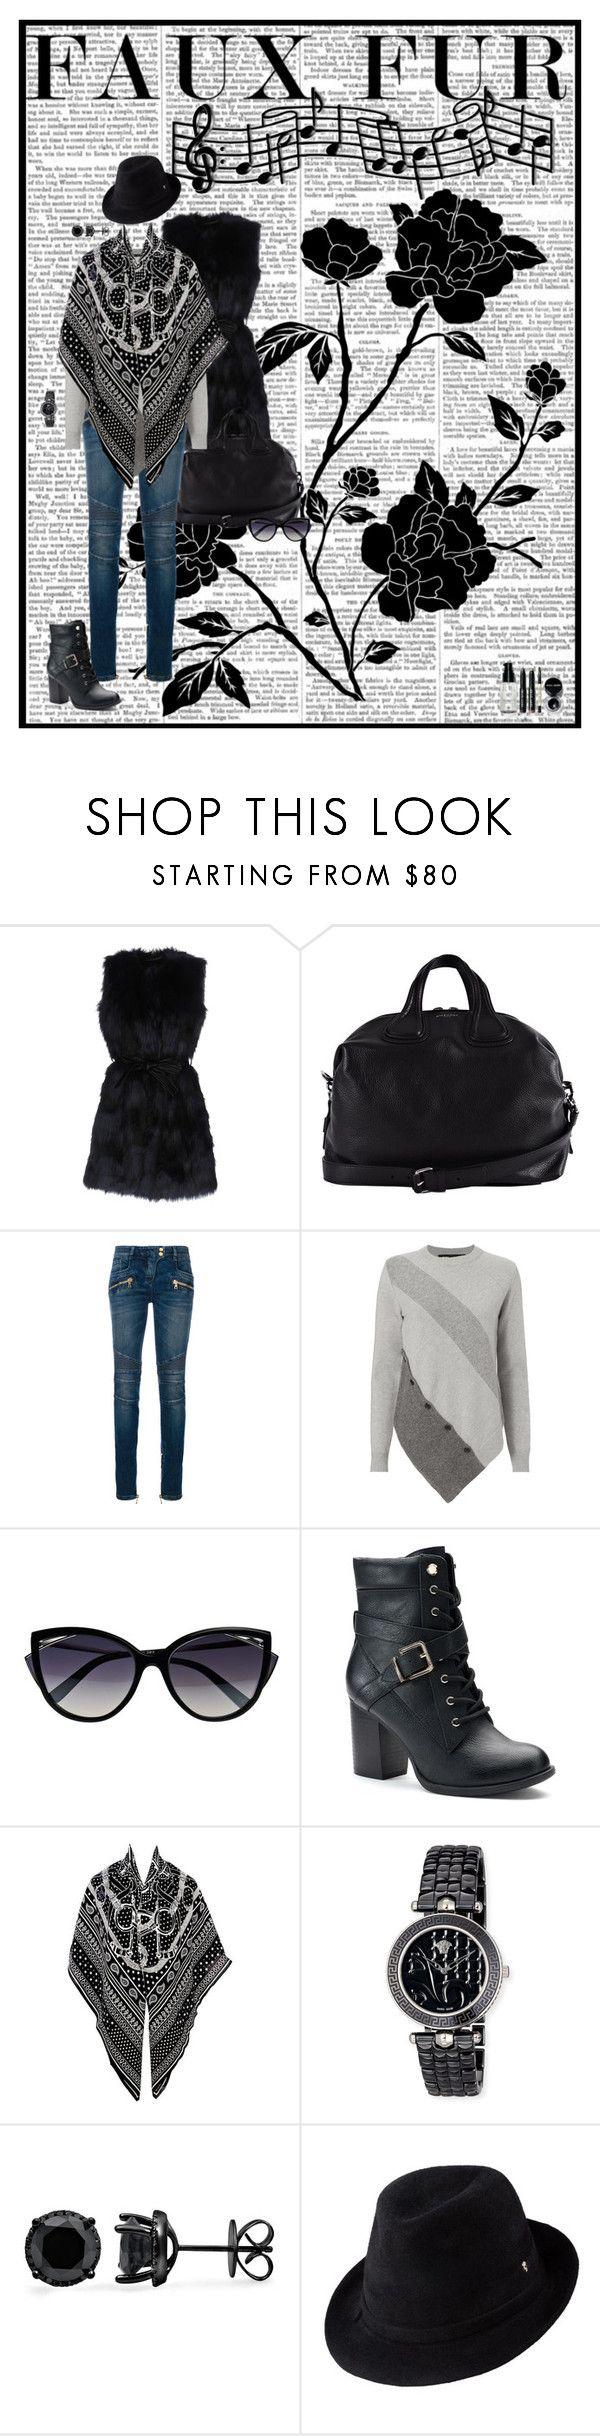 """Faux fur"" by bertoletka ❤ liked on Polyvore featuring Givenchy, Balmain, La Perla, Apt. 9, Hermès, Versace, Helen Kaminski, Bobbi Brown Cosmetics and fauxfur"